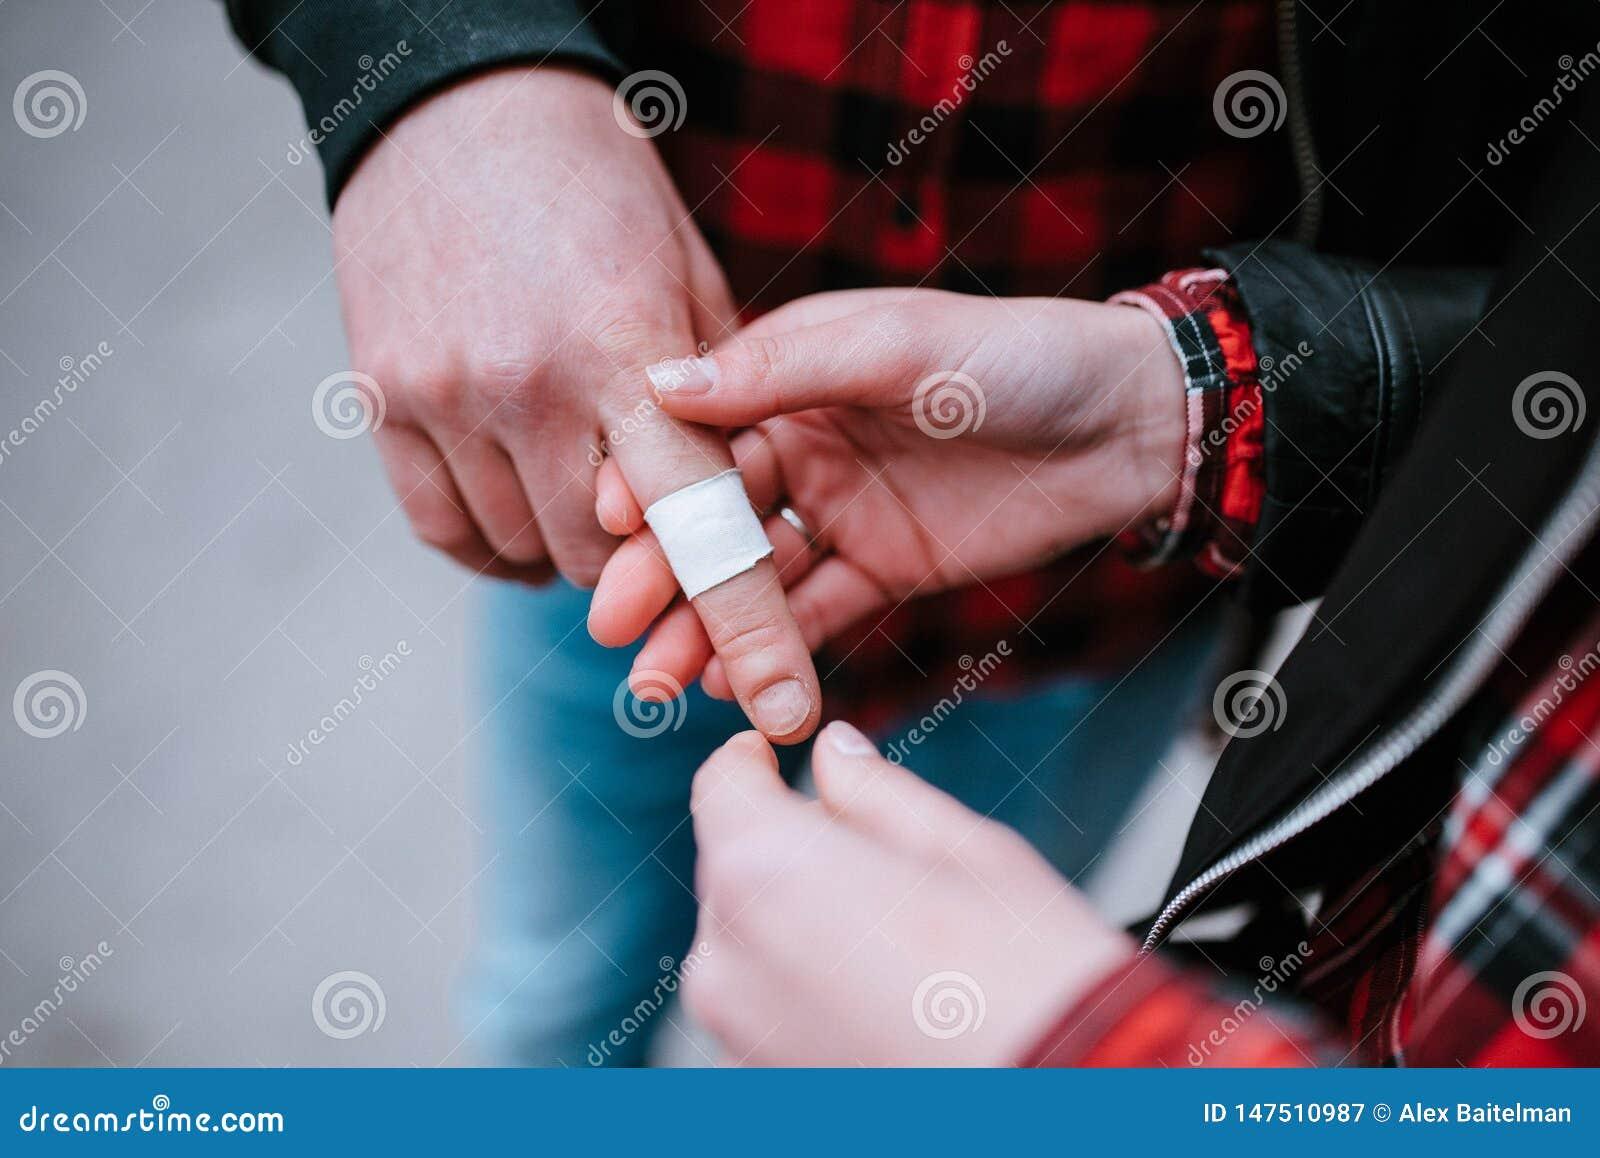 white bactericidal plaster on finger close up